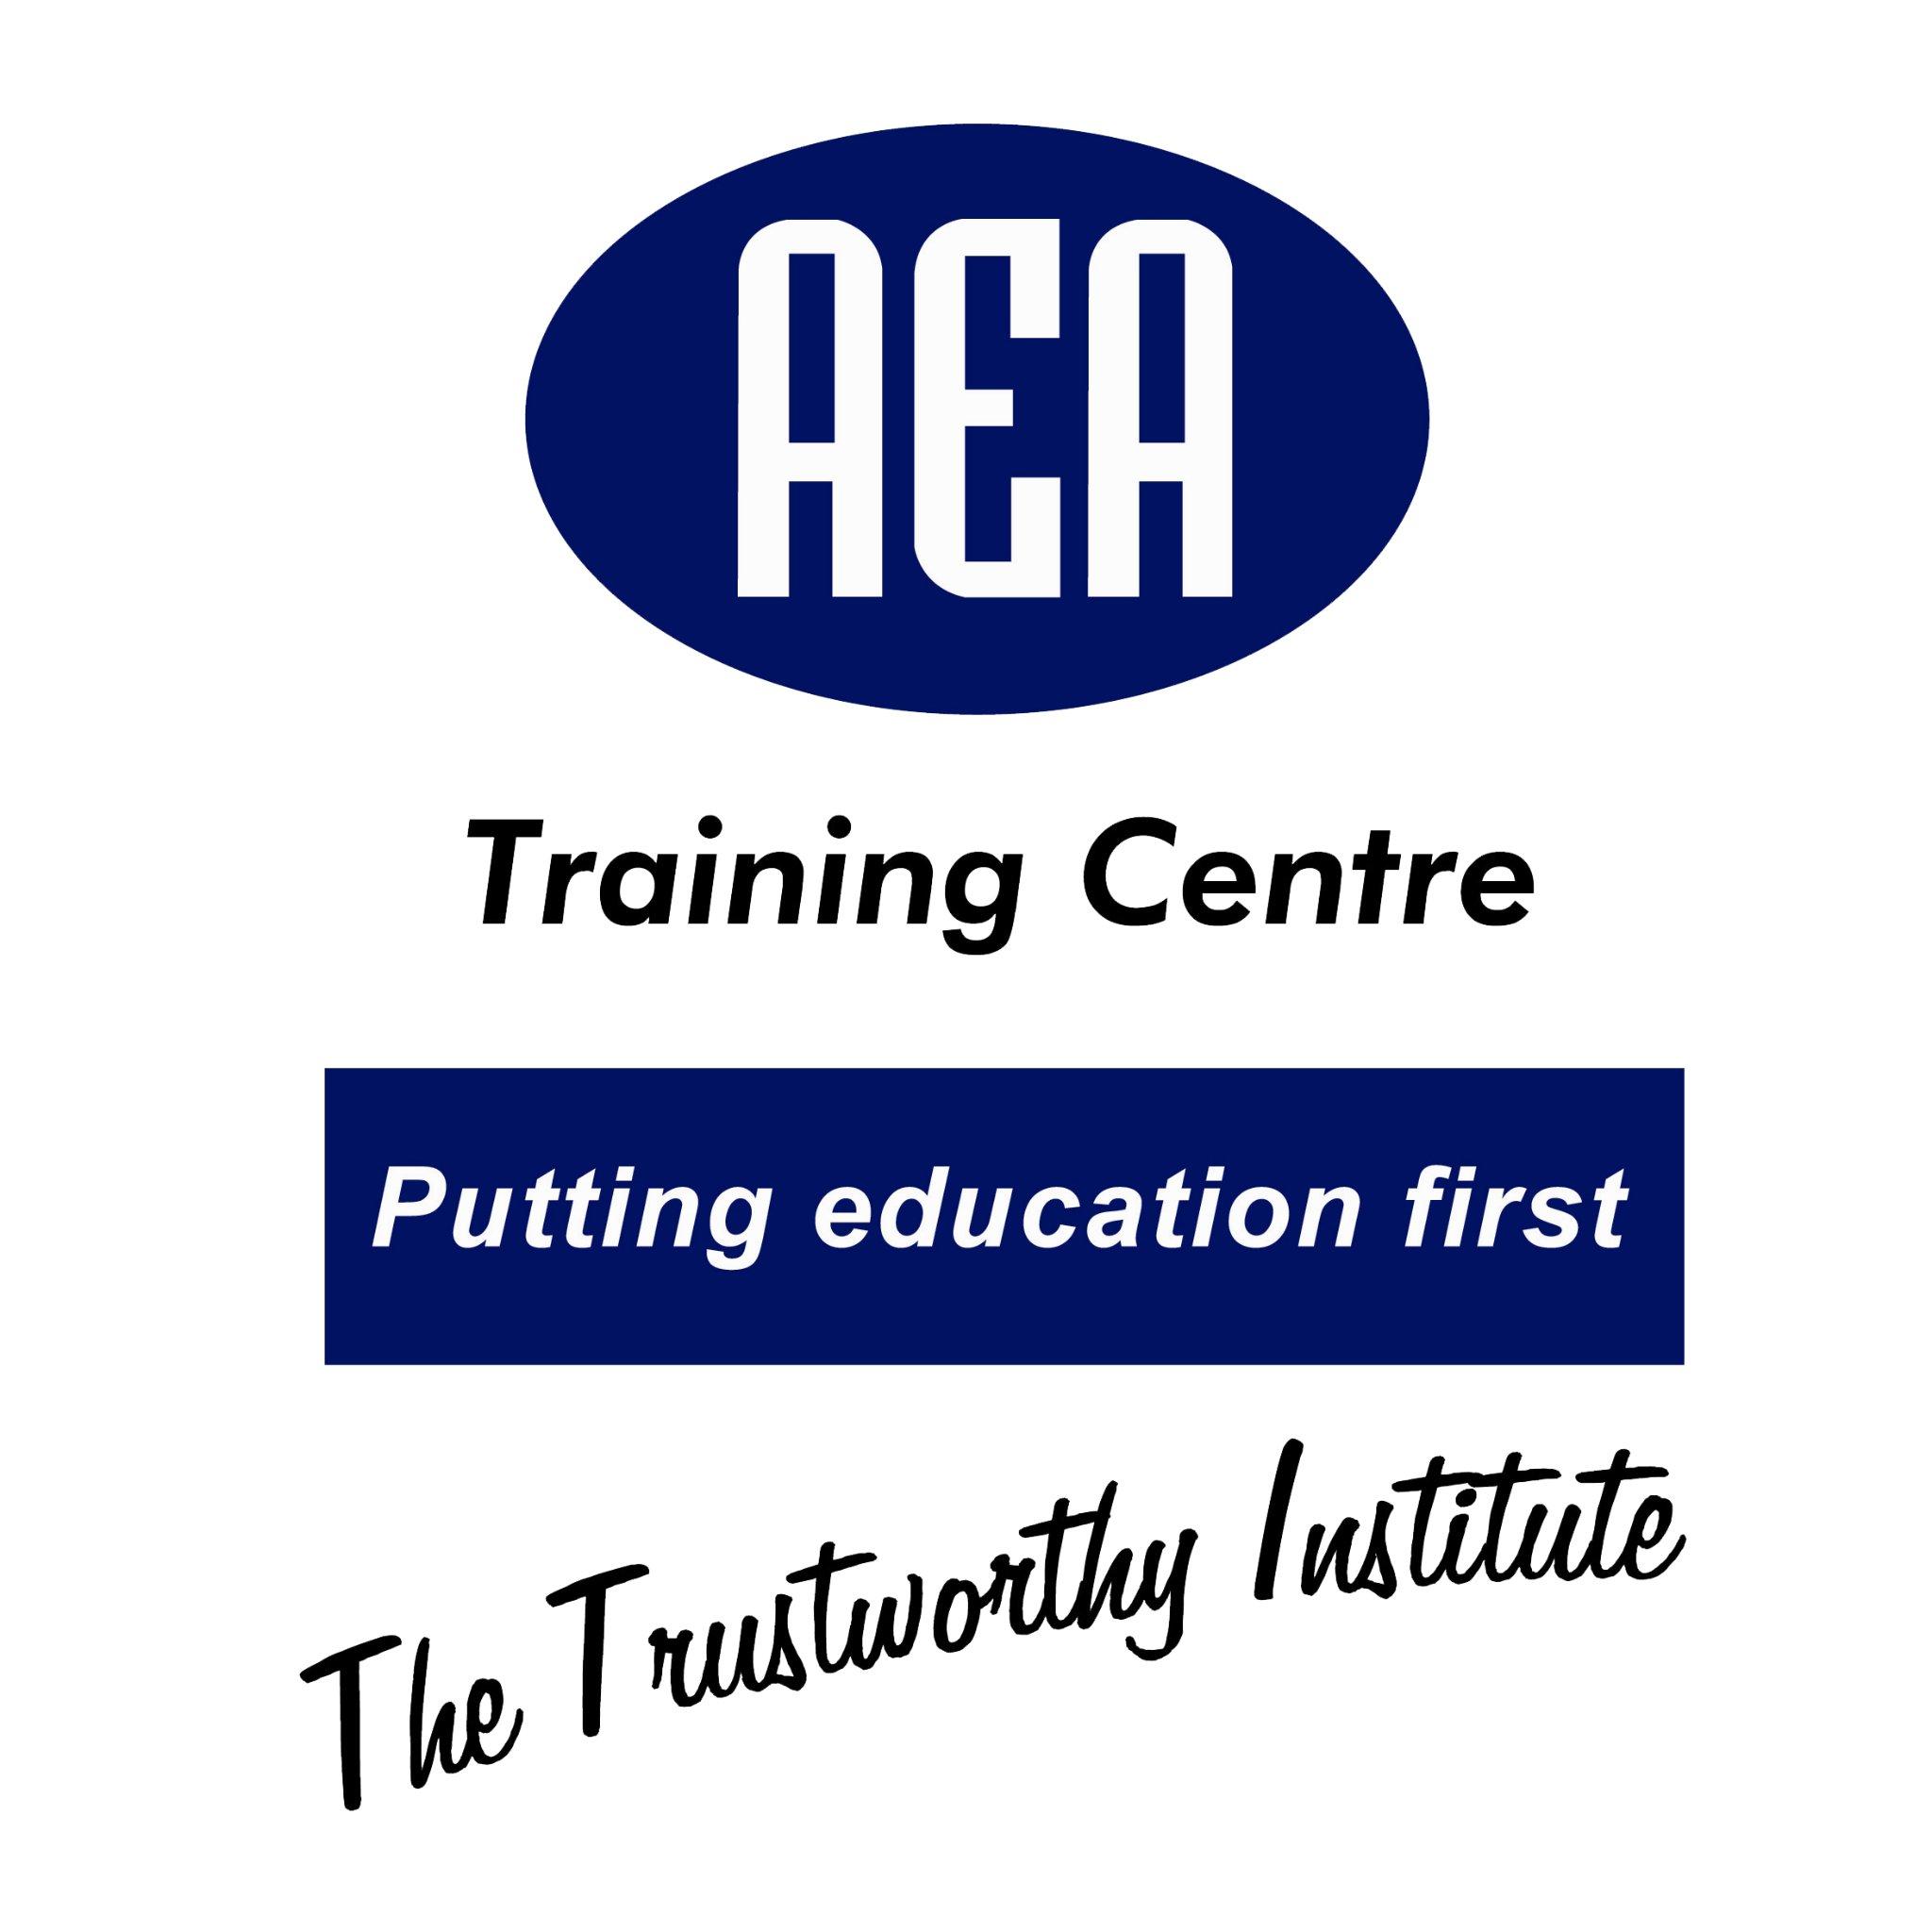 Aea training centre aeatraining twitter aea training centre xflitez Image collections